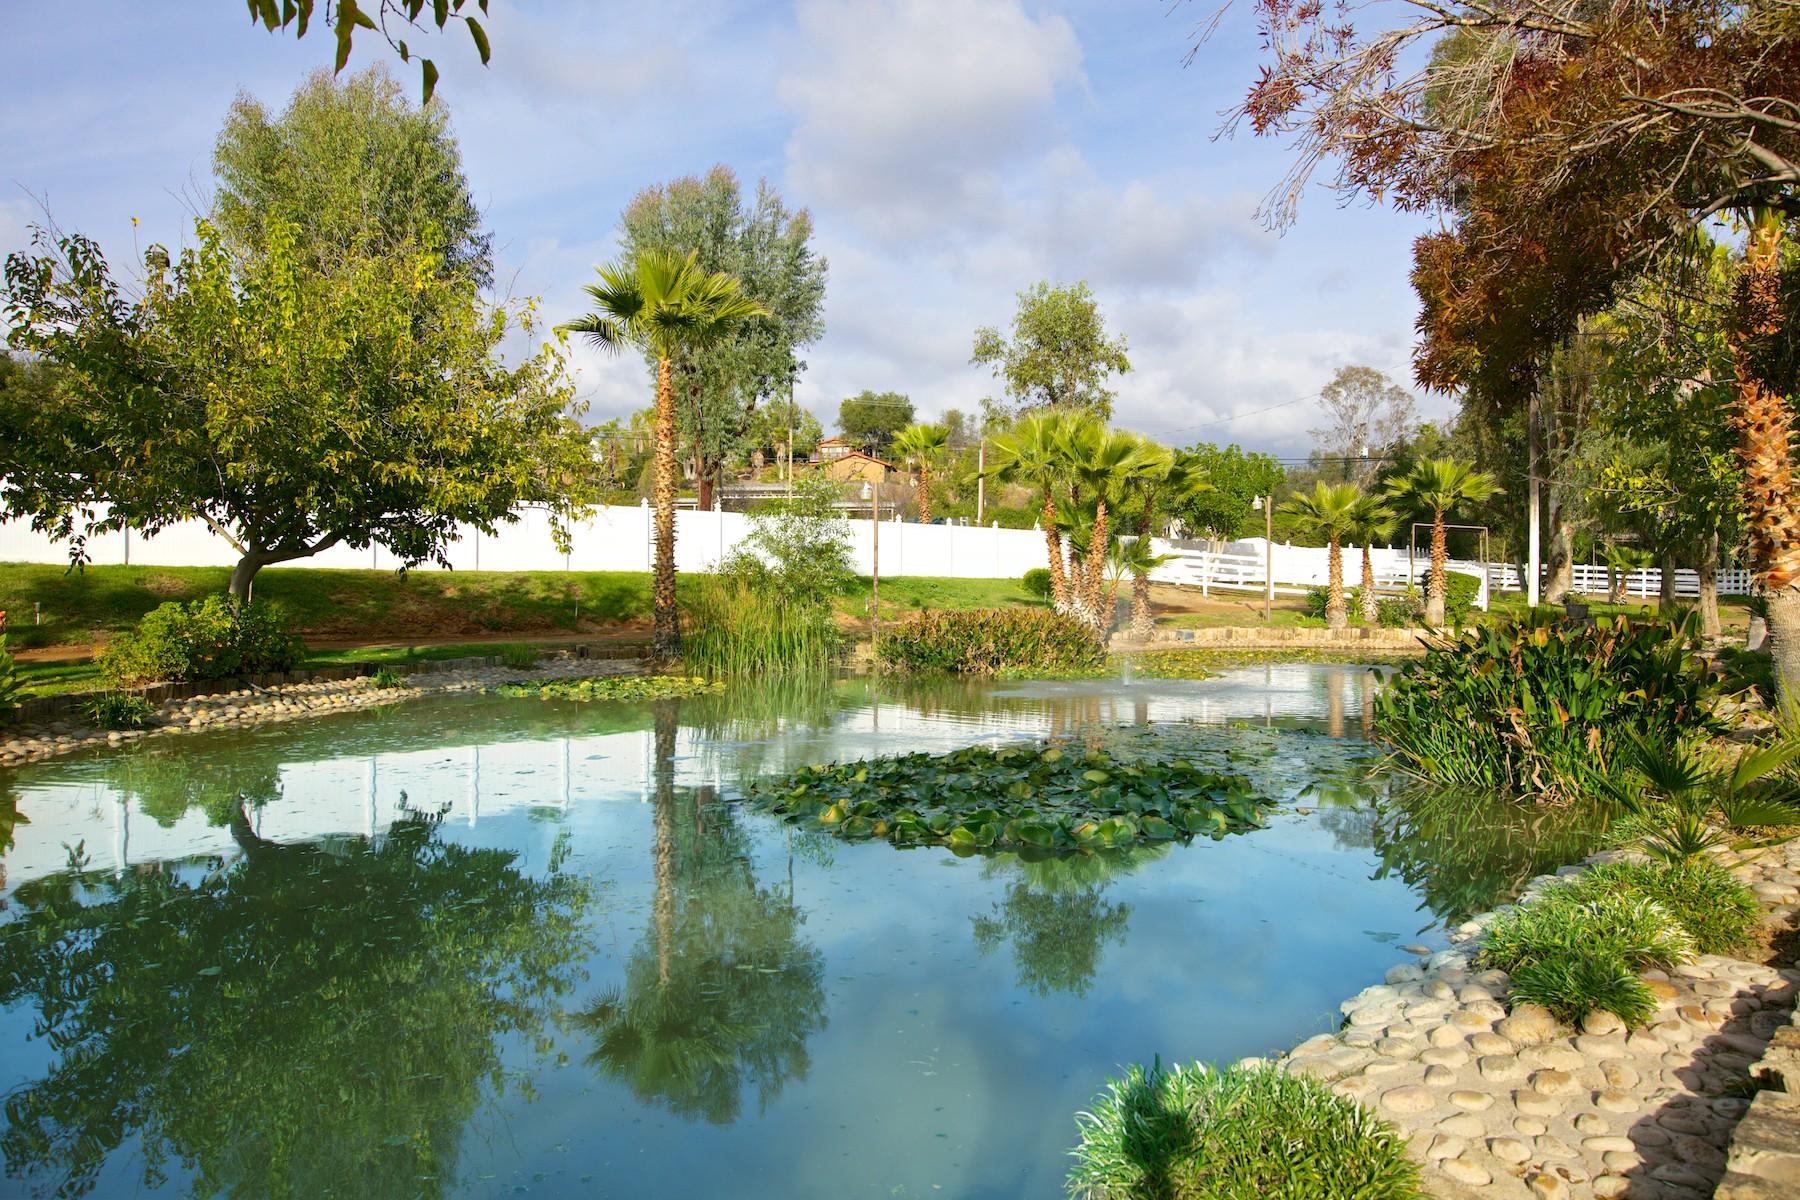 Additional photo for property listing at 1291 Summit Place  Escondido, California 92027 Estados Unidos